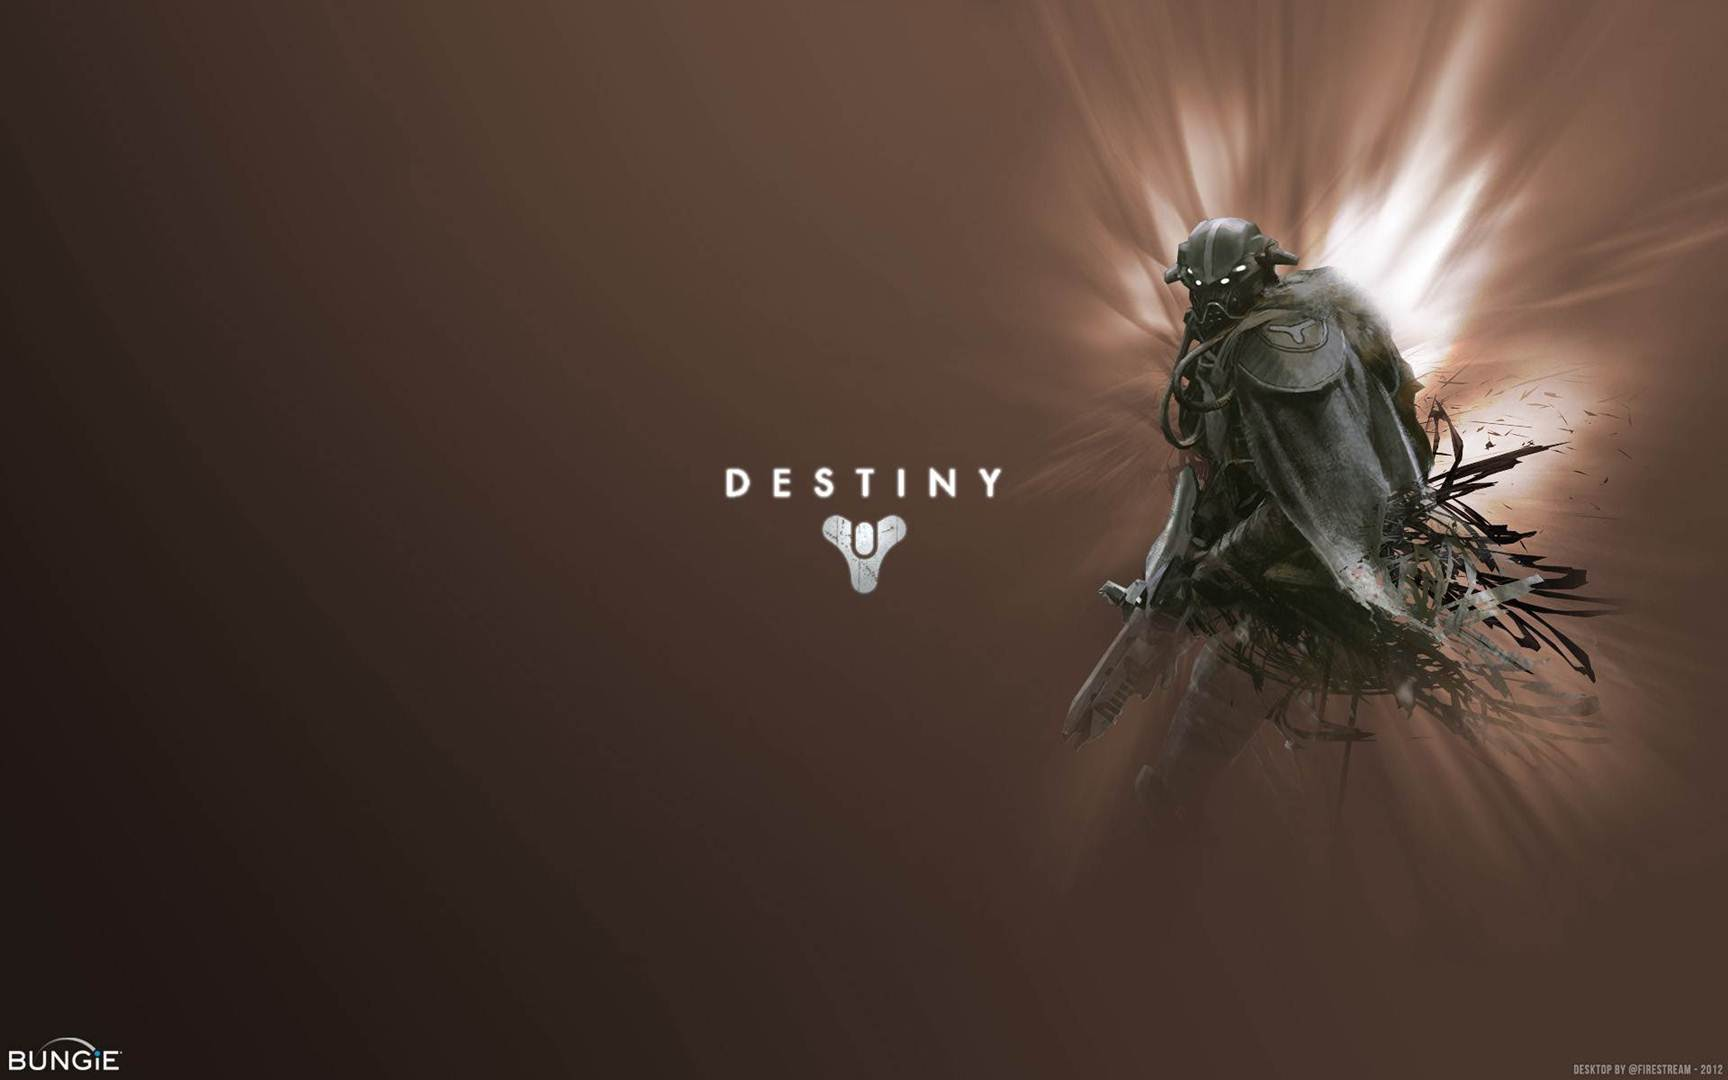 48 Bungie Destiny Wallpaper 1080p On Wallpapersafari